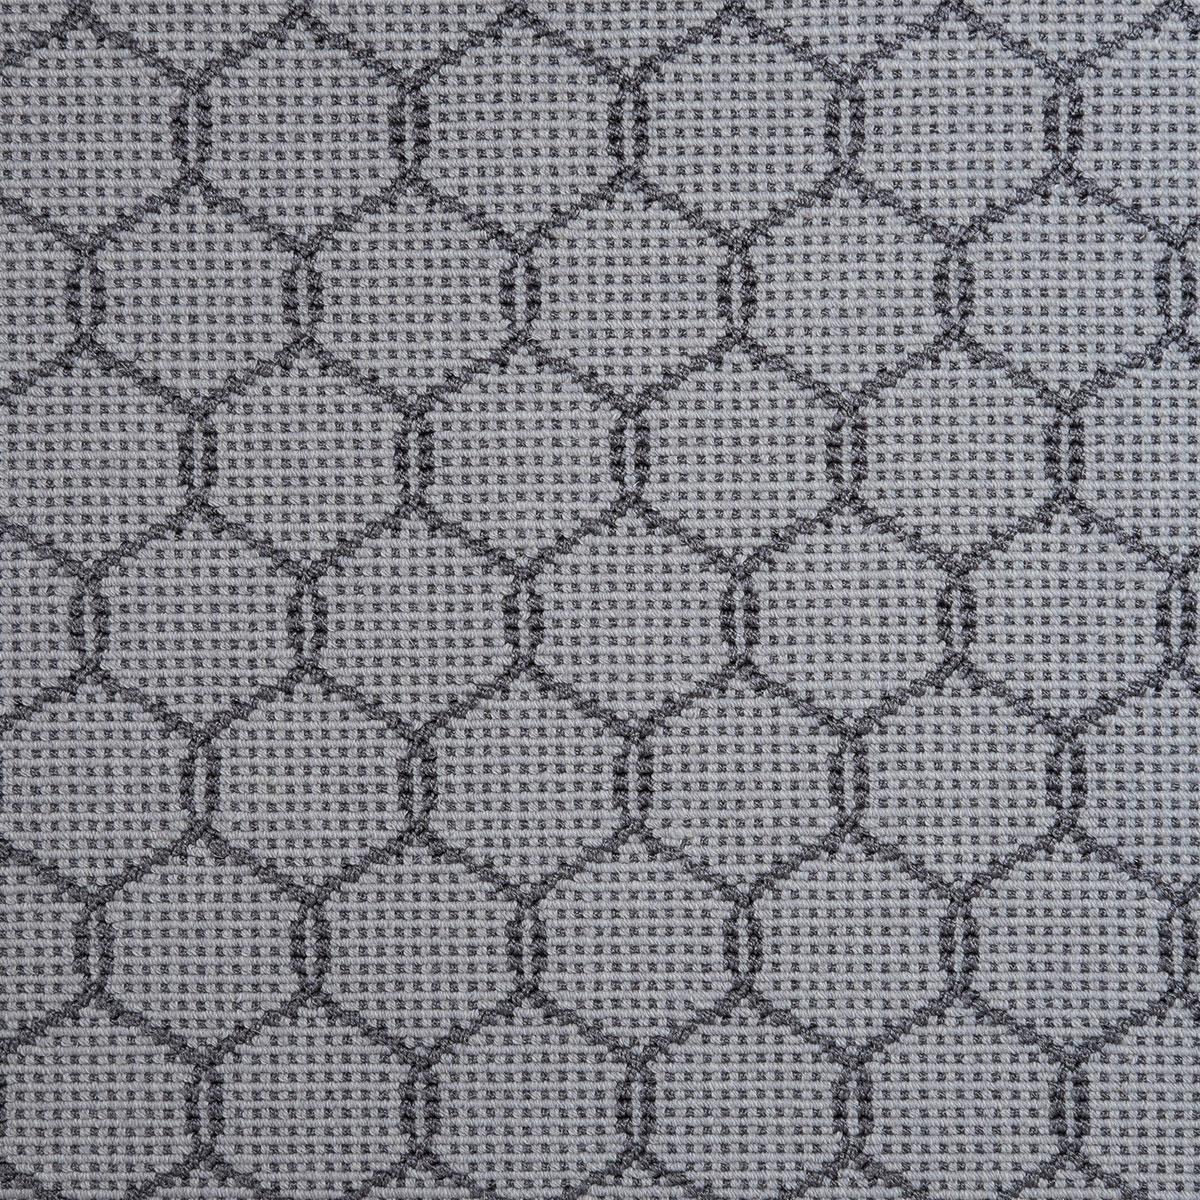 cates_wool-nylon-polysilk_broadloom_patterson-flynn-martin_pfm